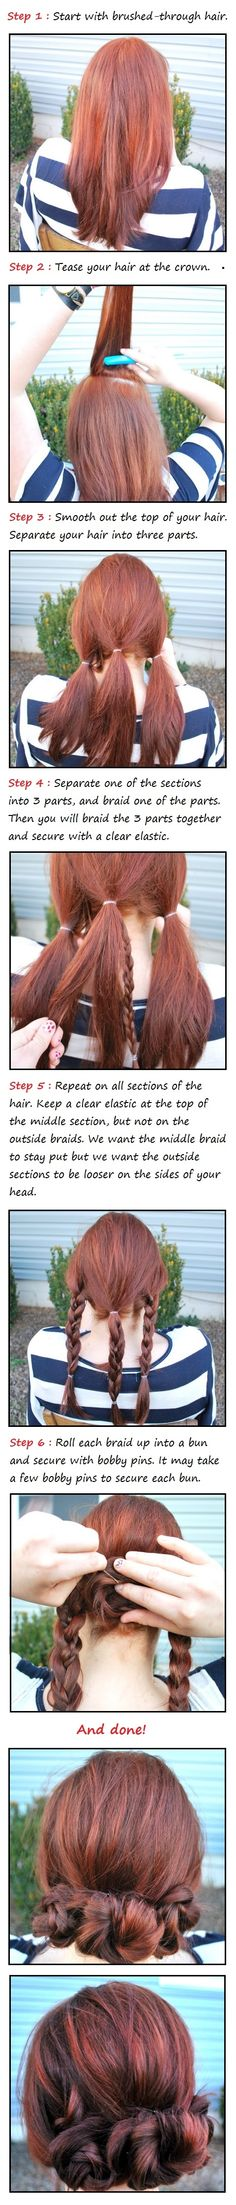 The three Braided Buns Hair Tutorial | Beauty Tutorials by imad karrari